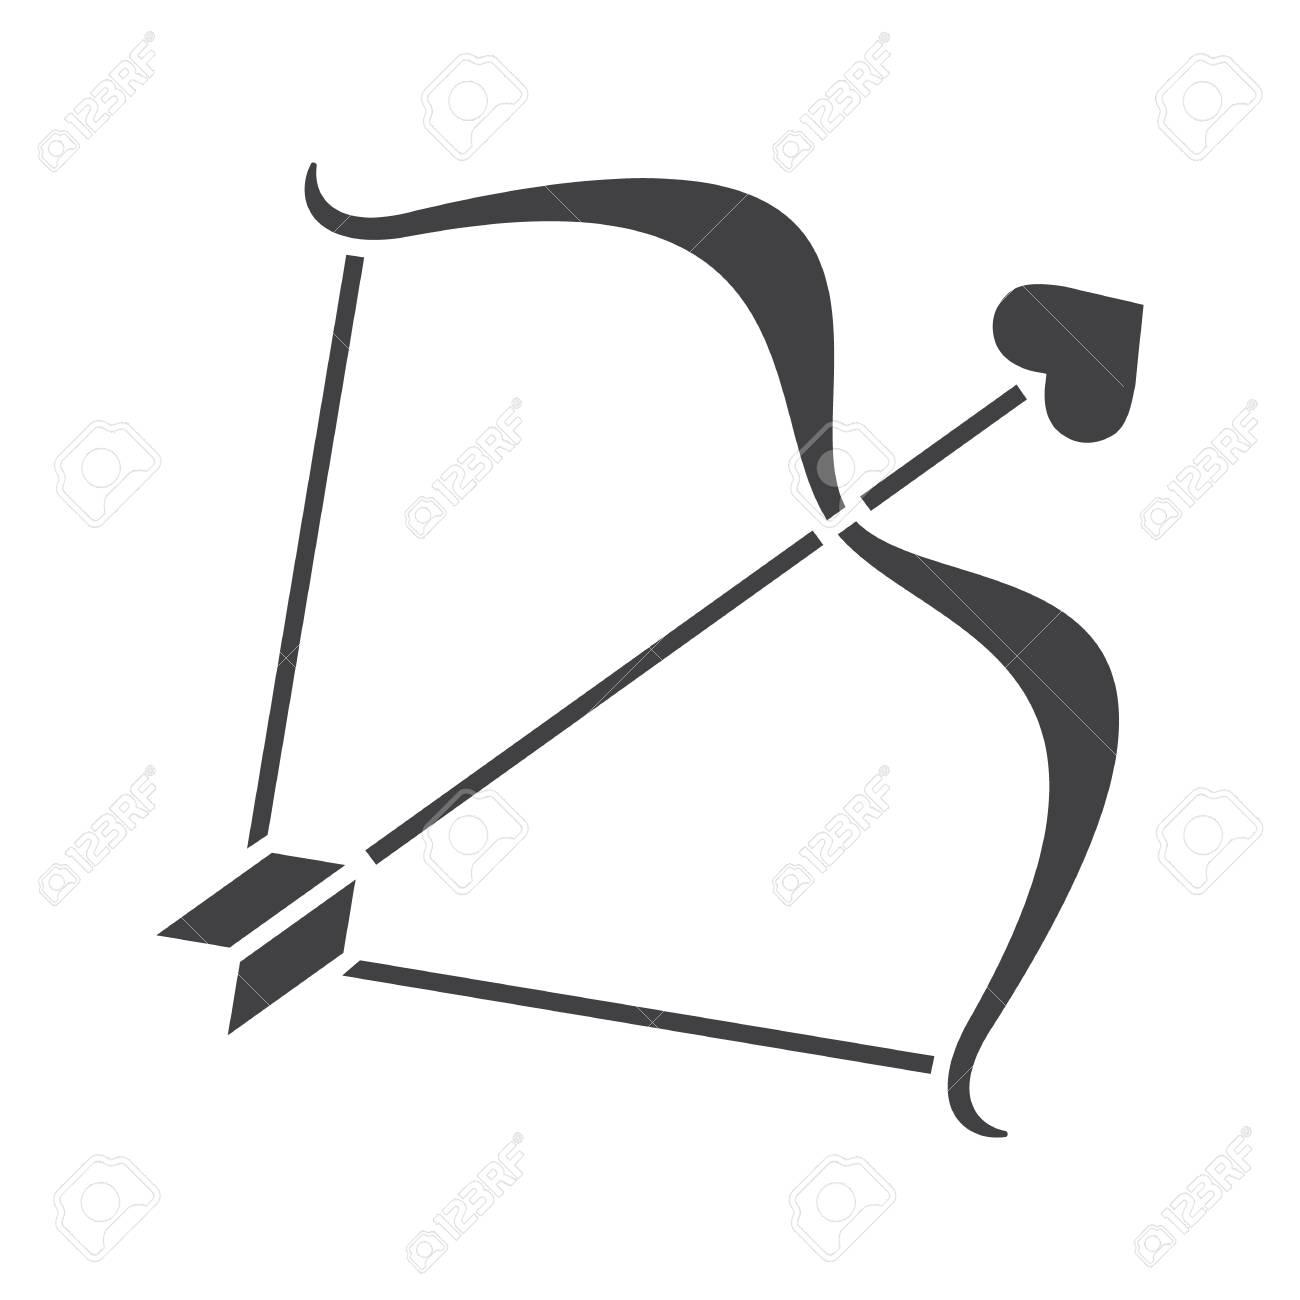 cupid s bow and arrow glyph icon silhouette symbol negative rh 123rf com Retro Clip Art Cupid's Arrow Cupid Arrow Clip Art Black and White